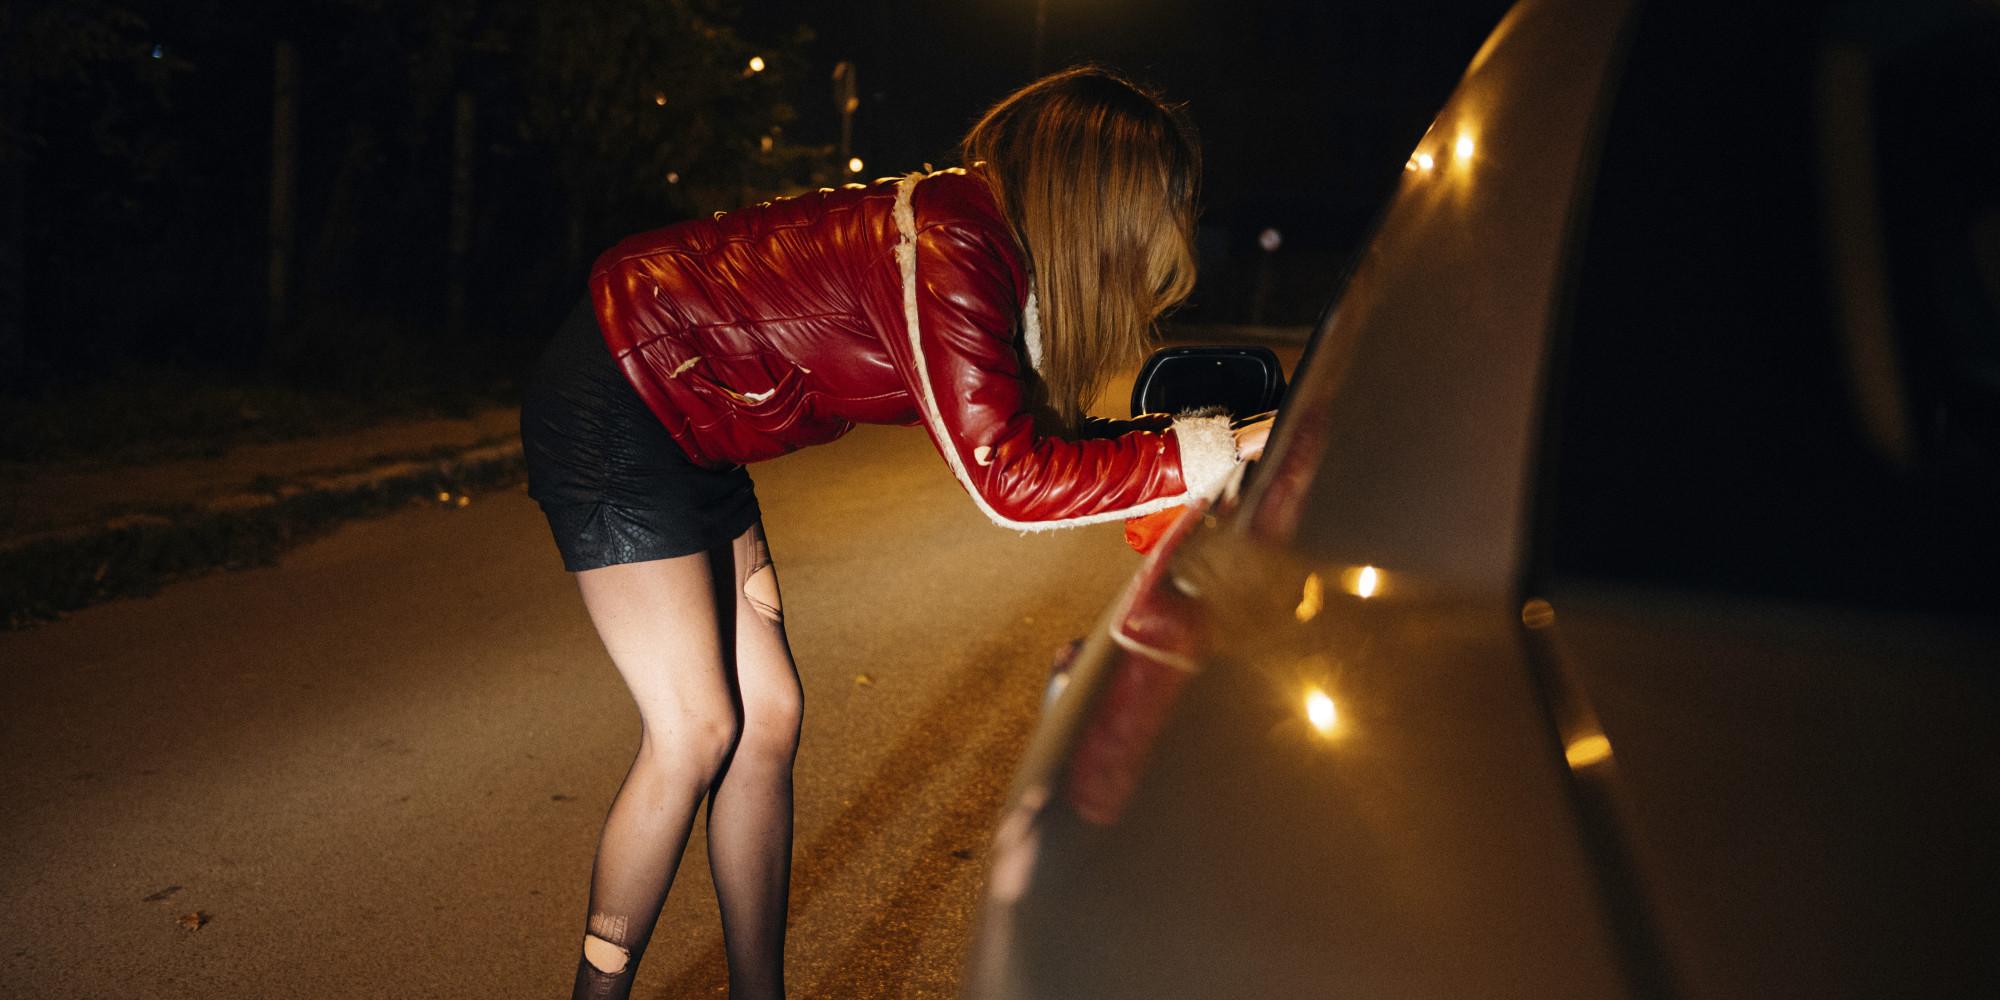 boy fuck girl best prostitute in melbourne